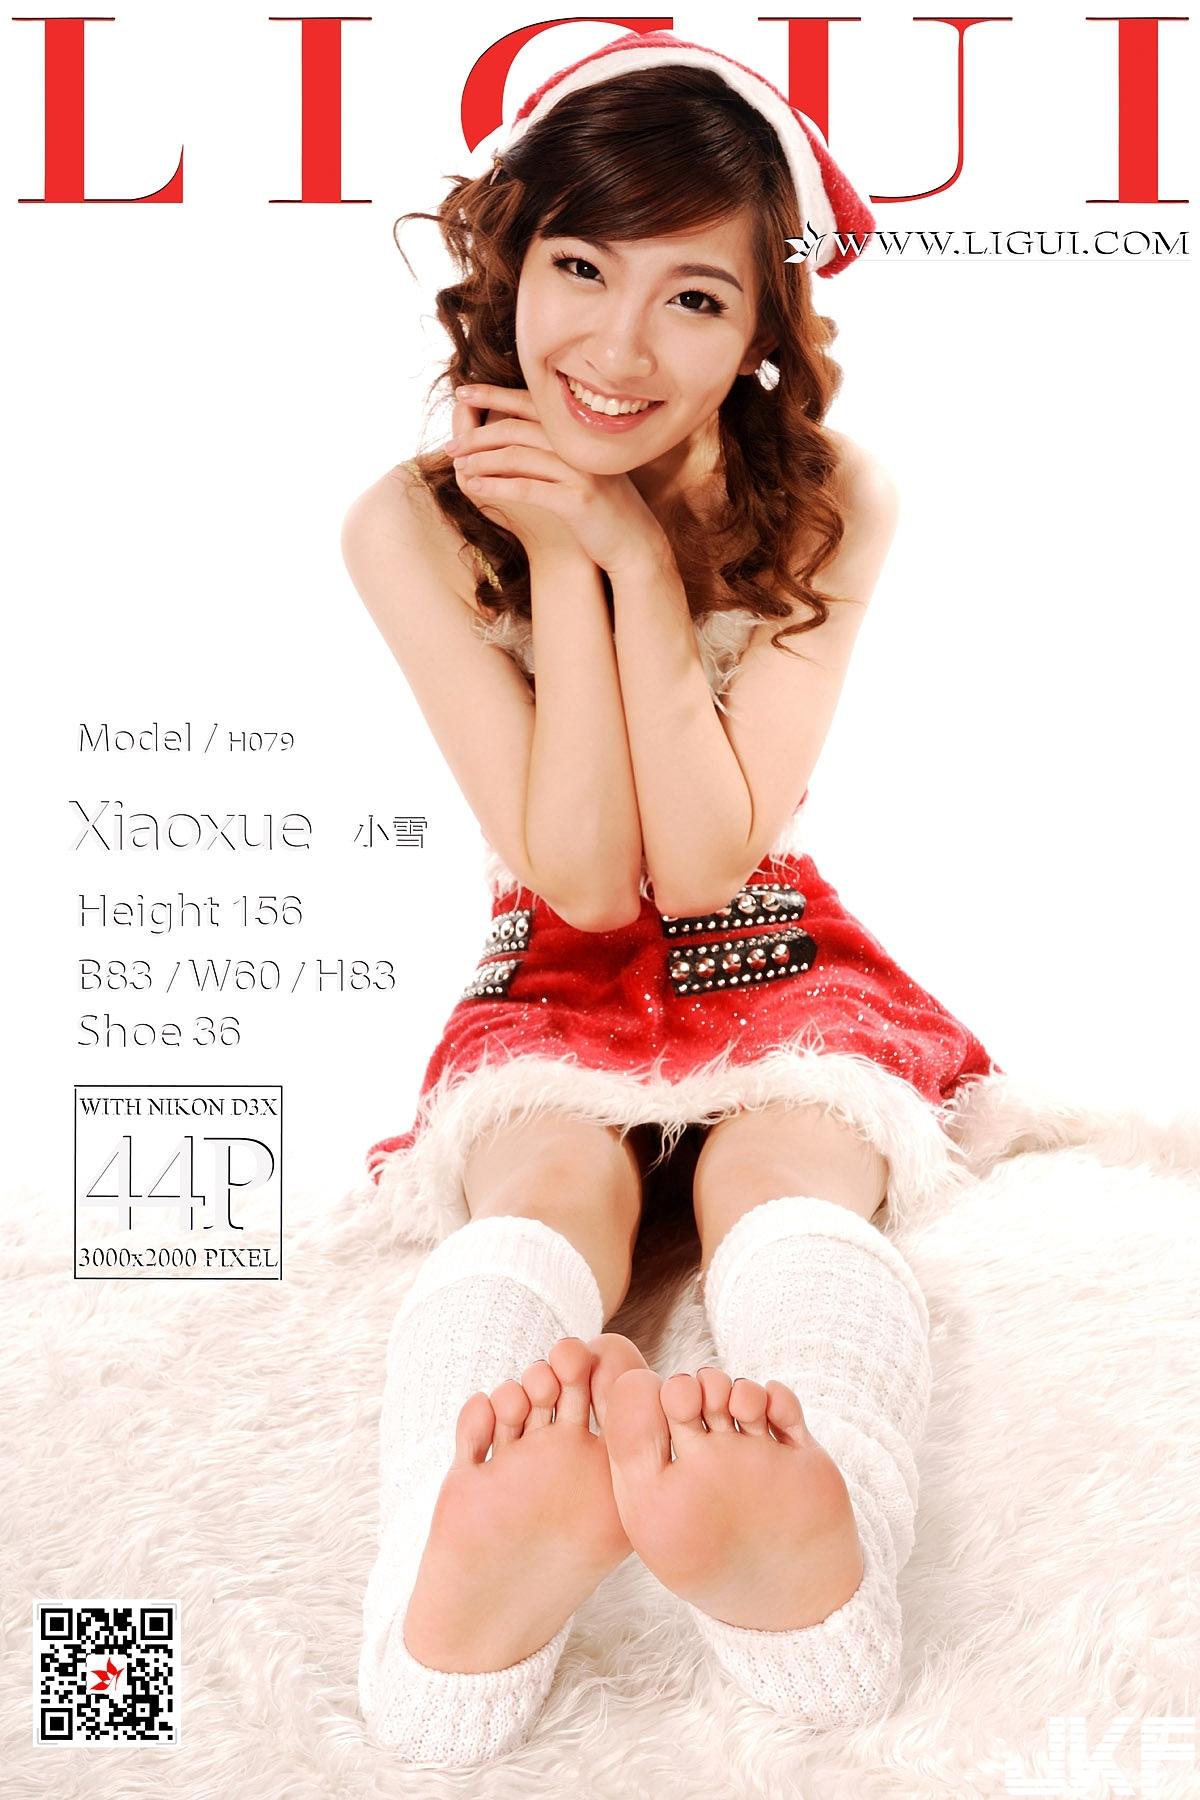 【Ligui麗櫃網路麗人系列】2018.04.02 Model 小雪 - 貼圖 - 絲襪美腿 -